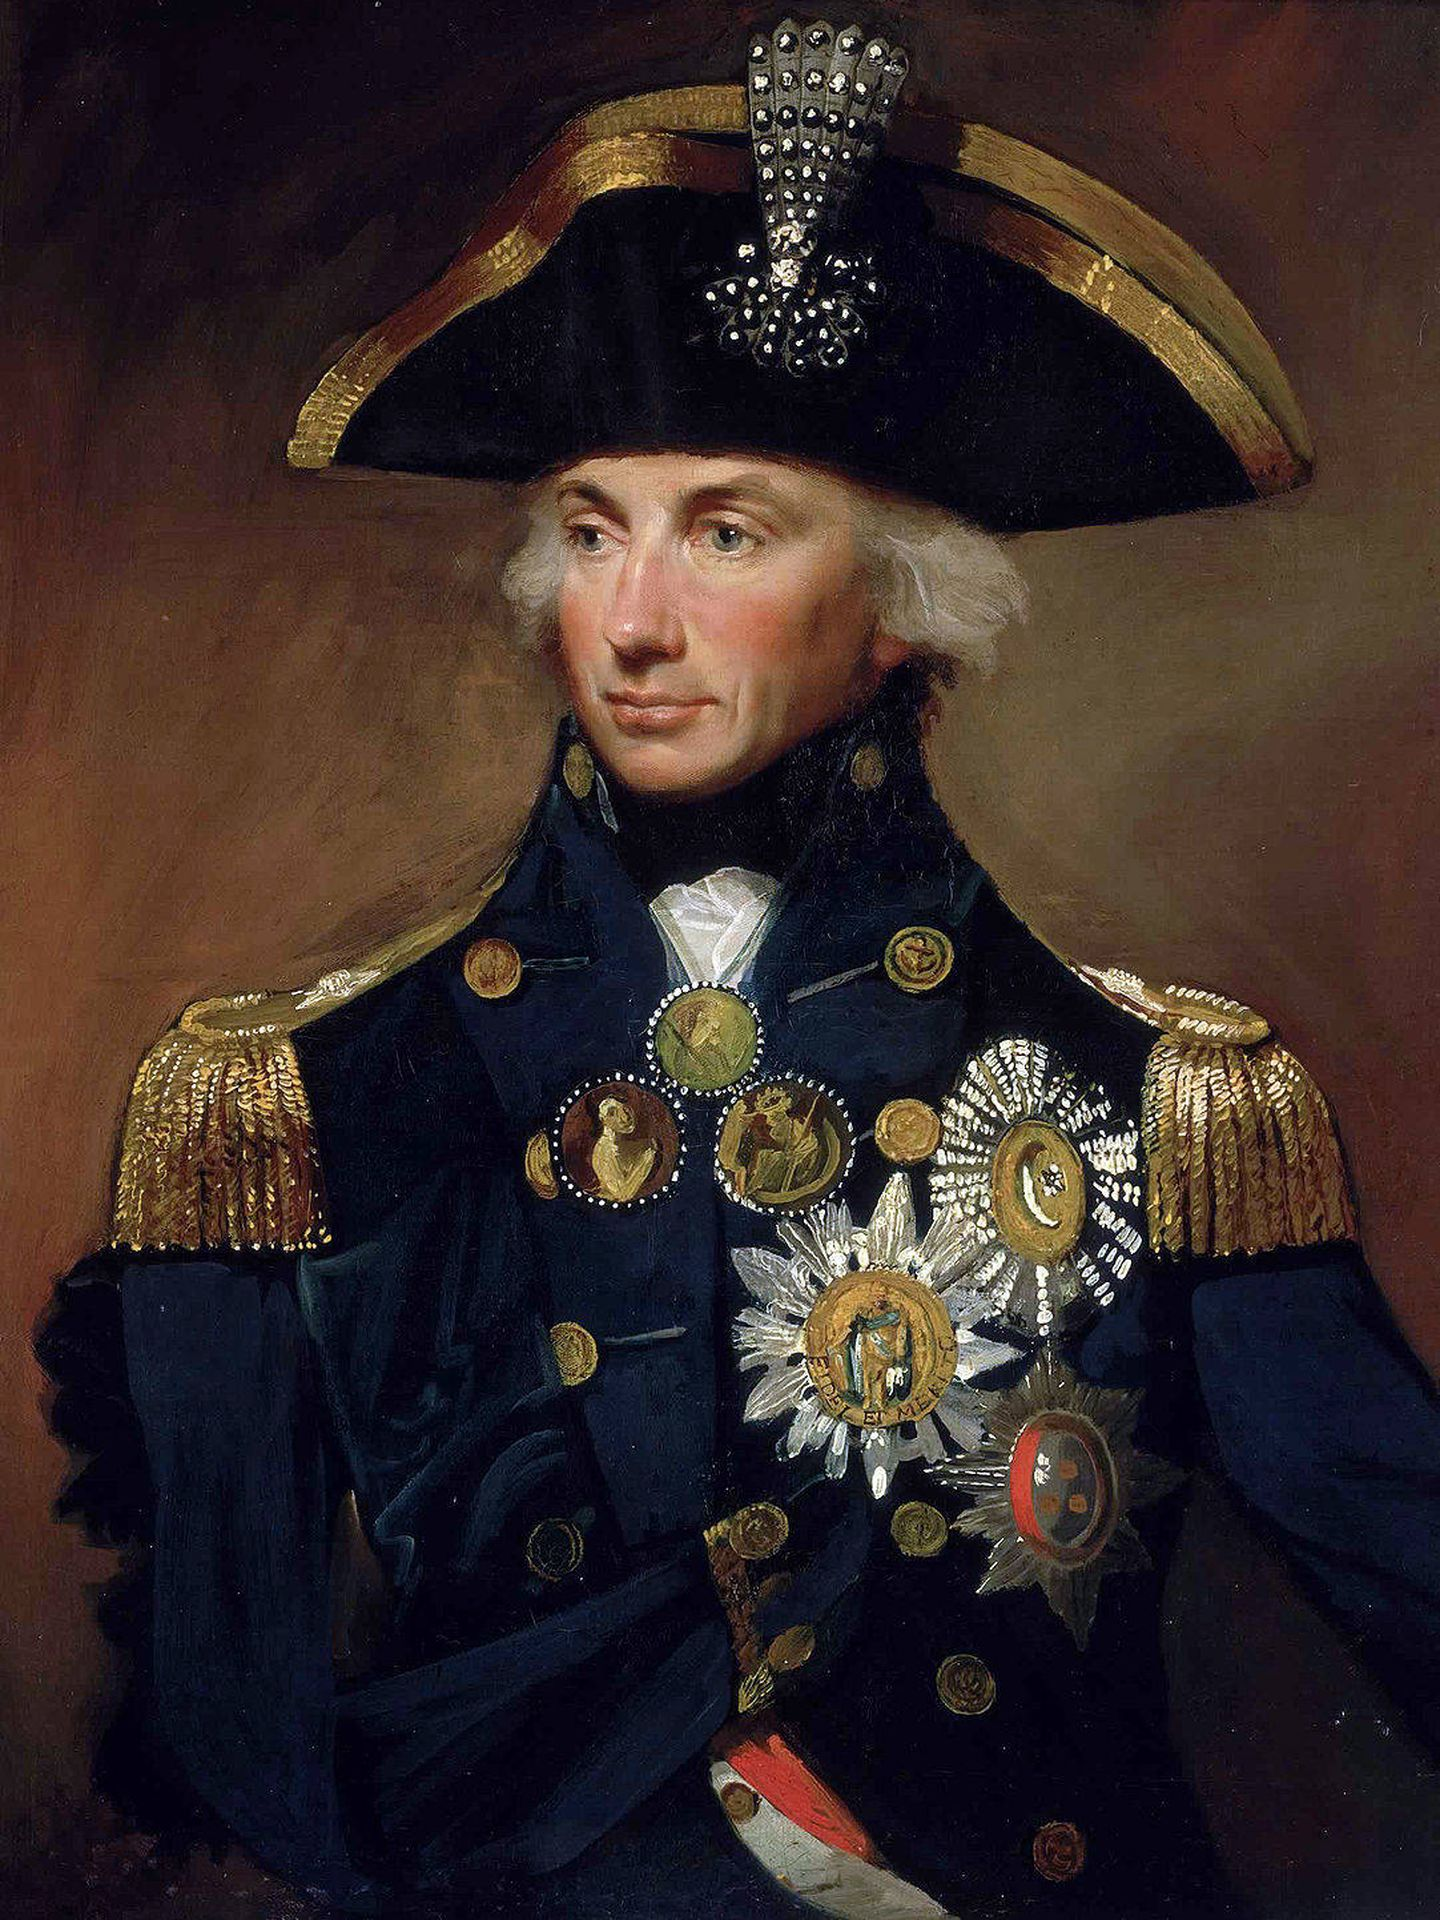 El comandante Nelson.